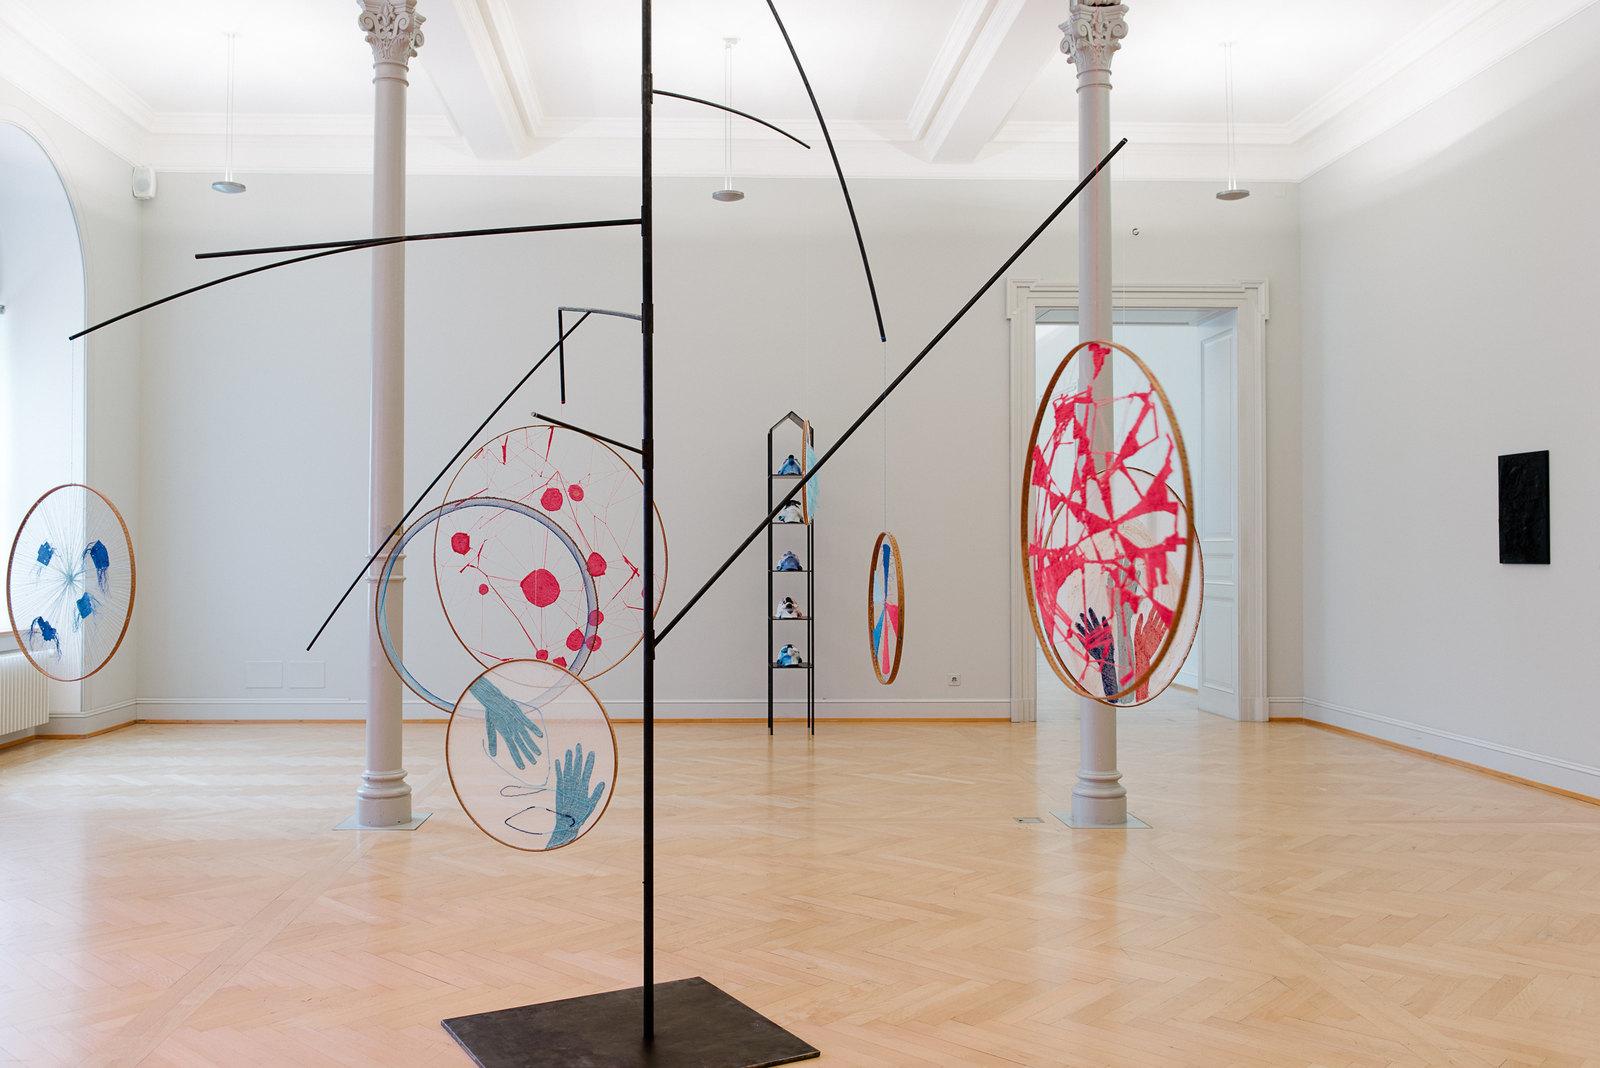 20_Installationsansicht_St.Gallen_Foto_Sebastian_Stadler